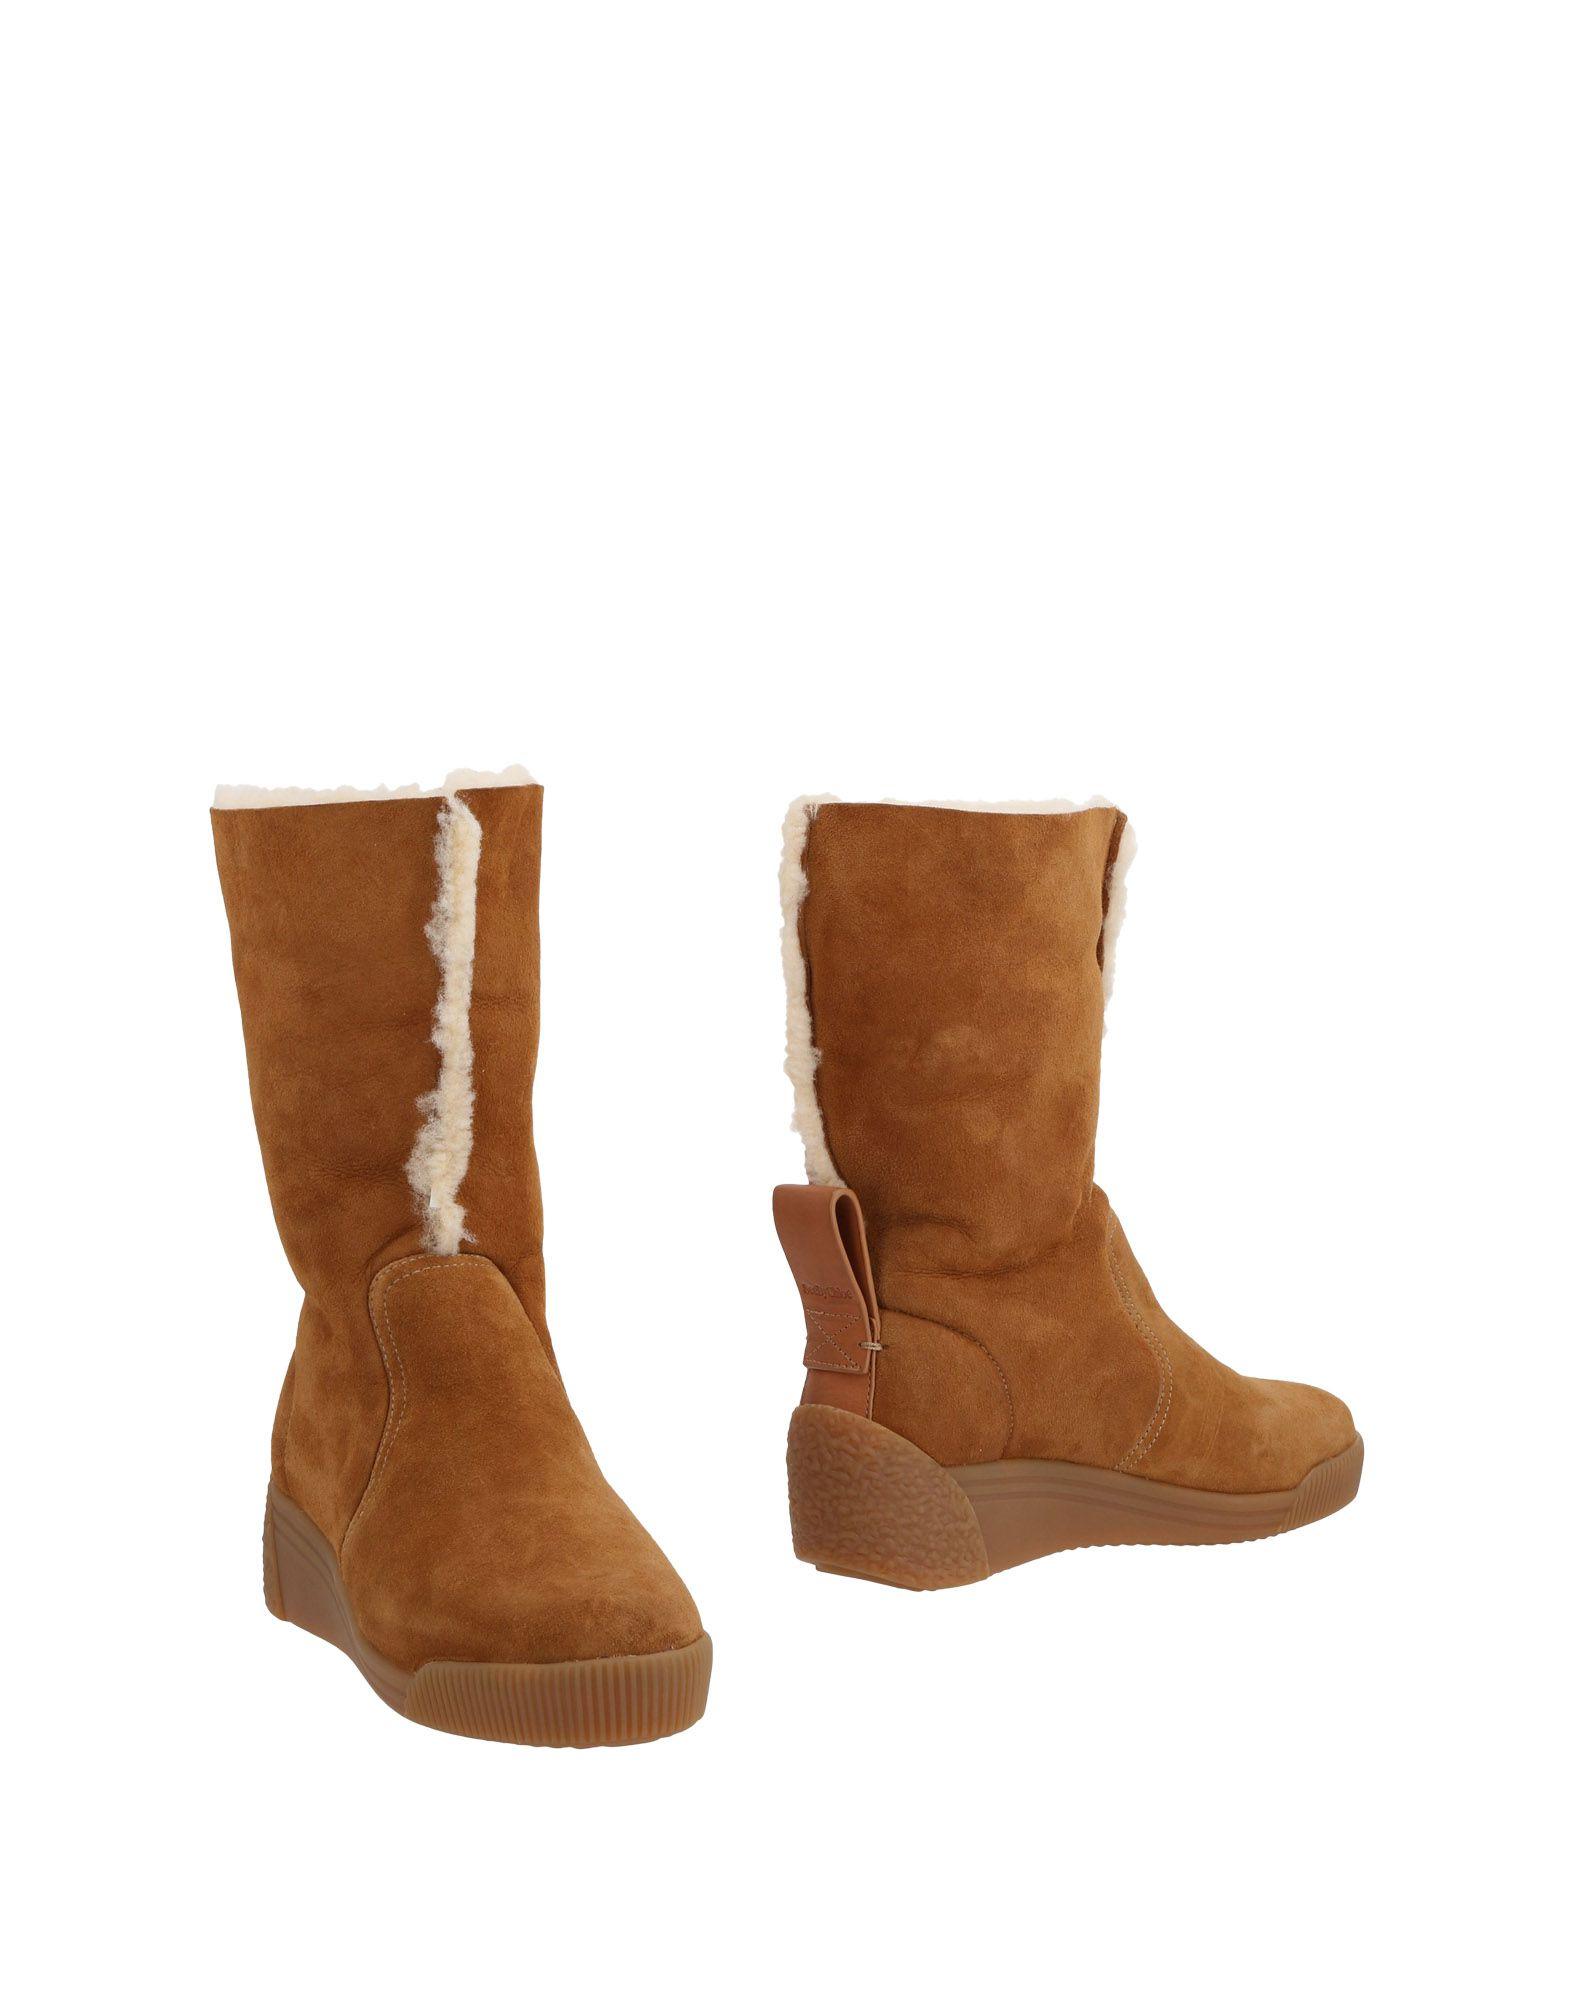 See By Chloé Stiefelette Damen 11483442FIGut strapazierfähige aussehende strapazierfähige 11483442FIGut Schuhe 5d03e2